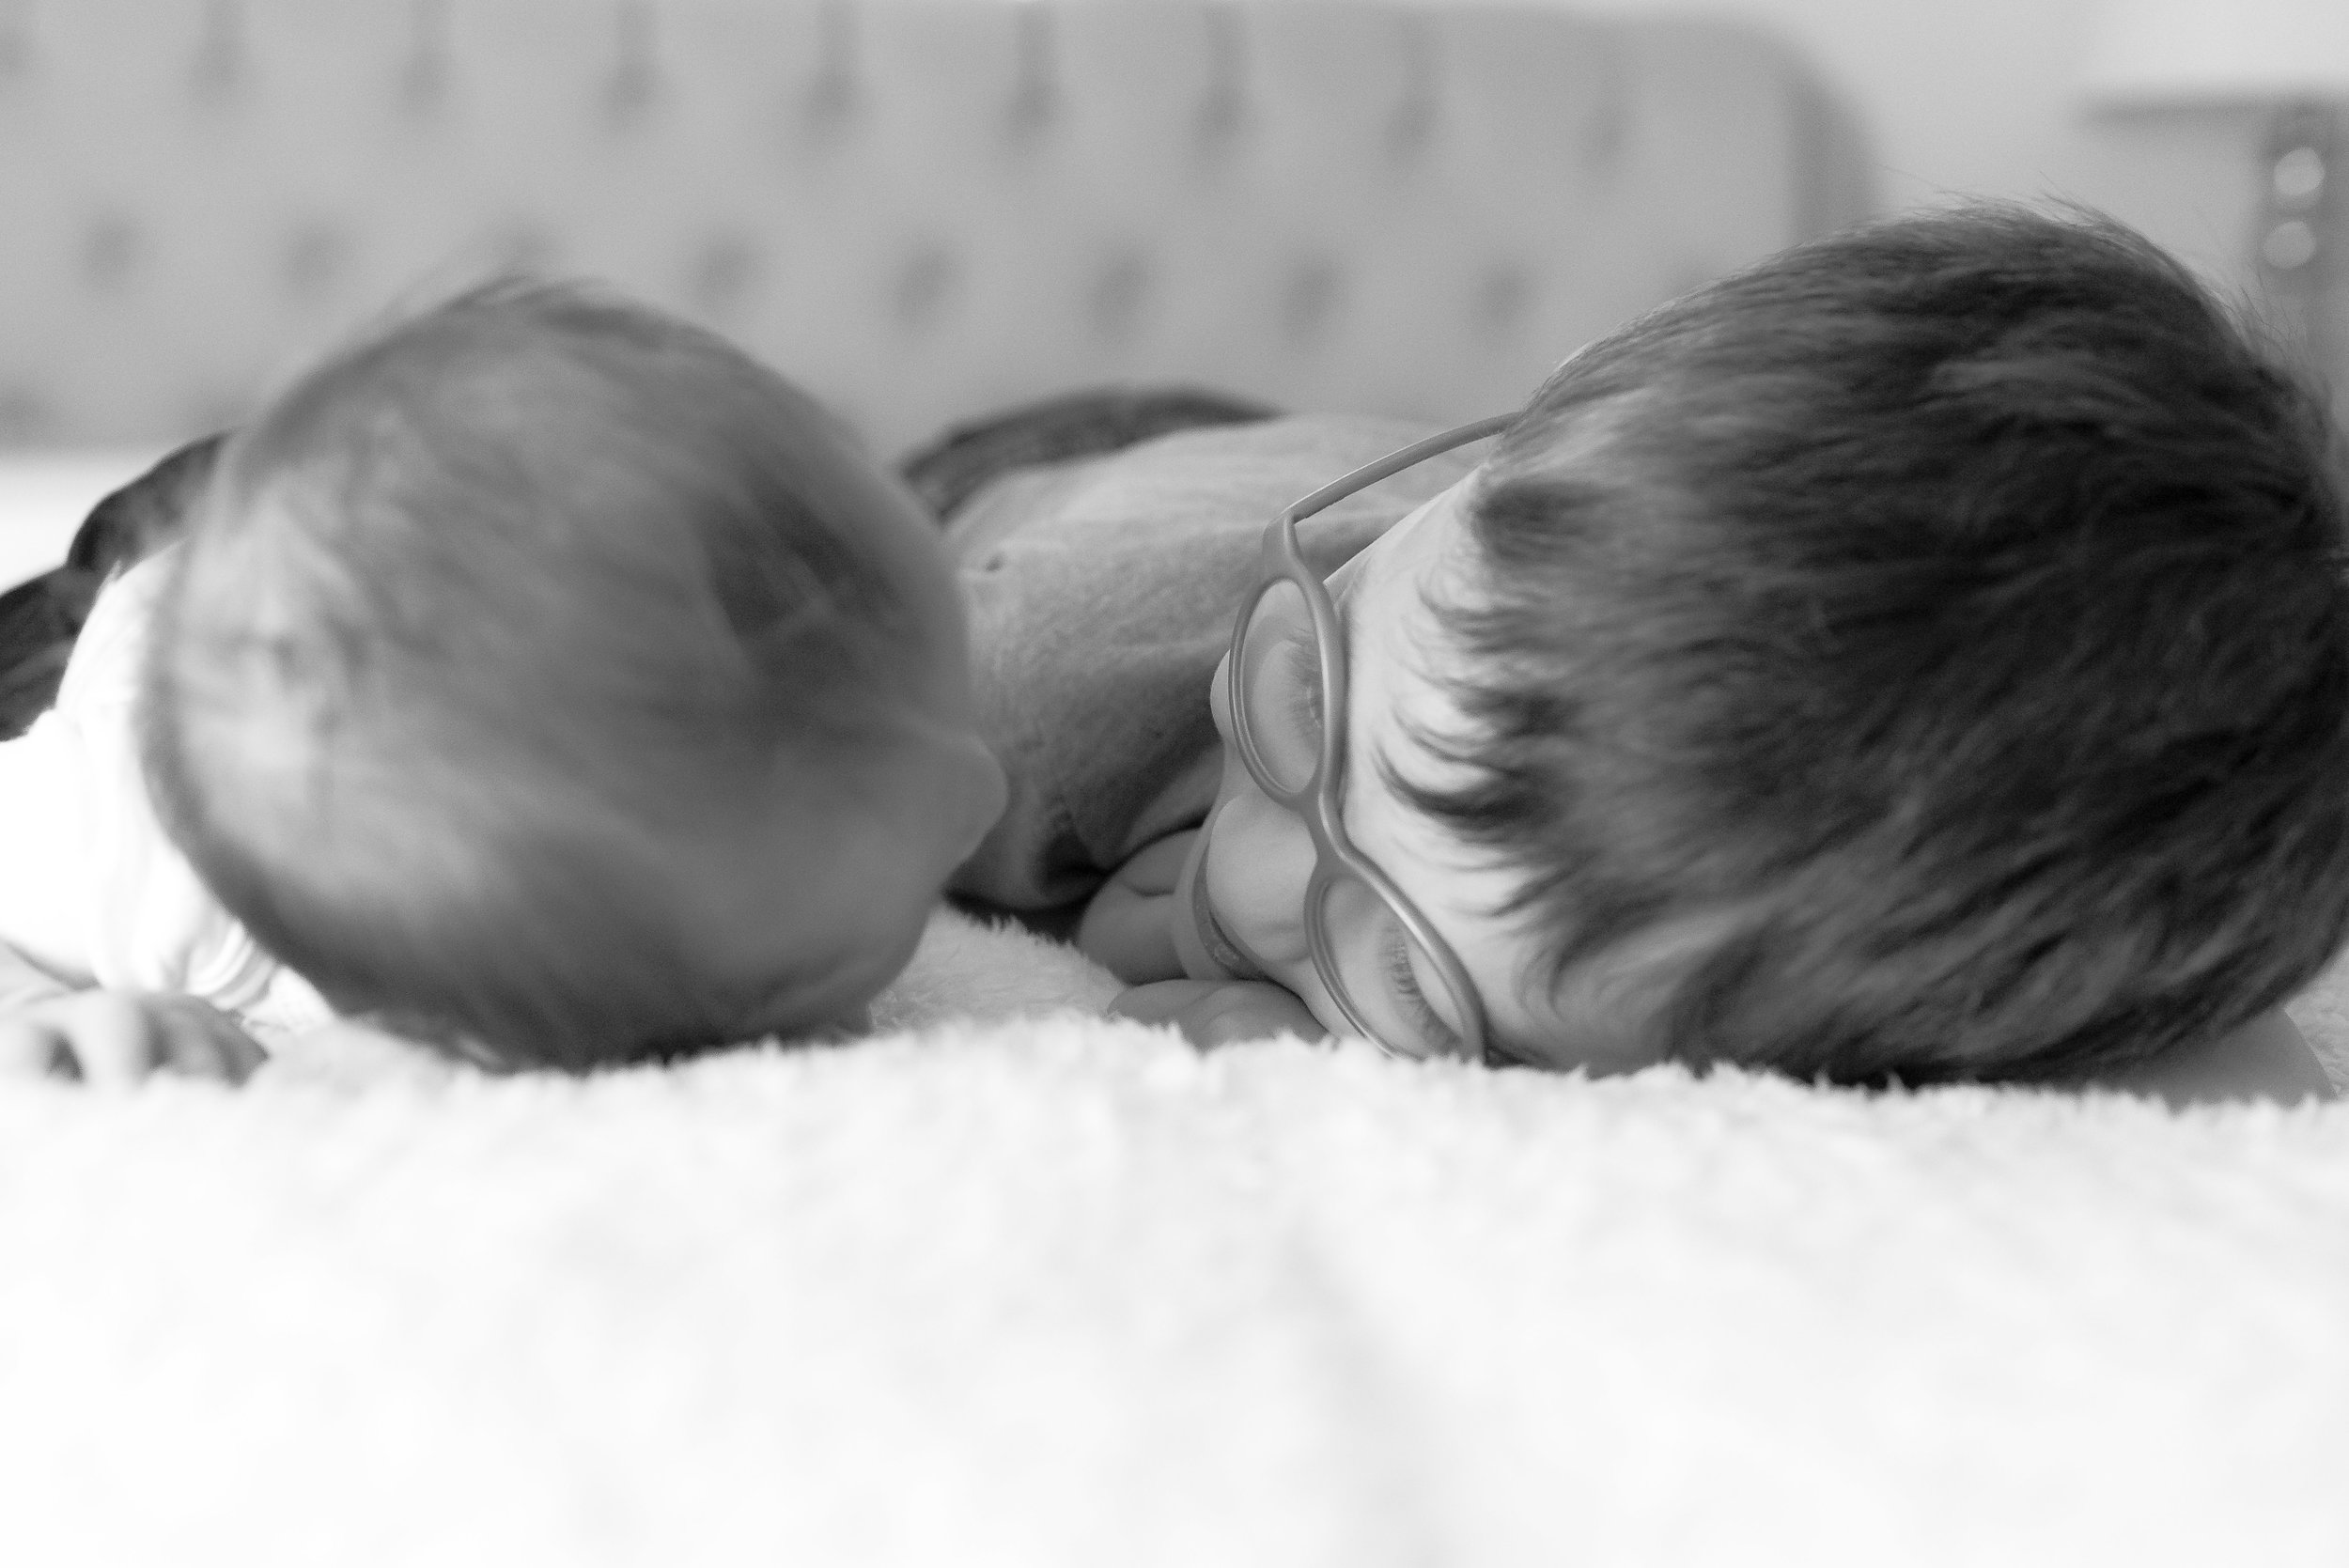 Erin-Fabio-Photography-Russell-Fischer_Newborns-101.jpg